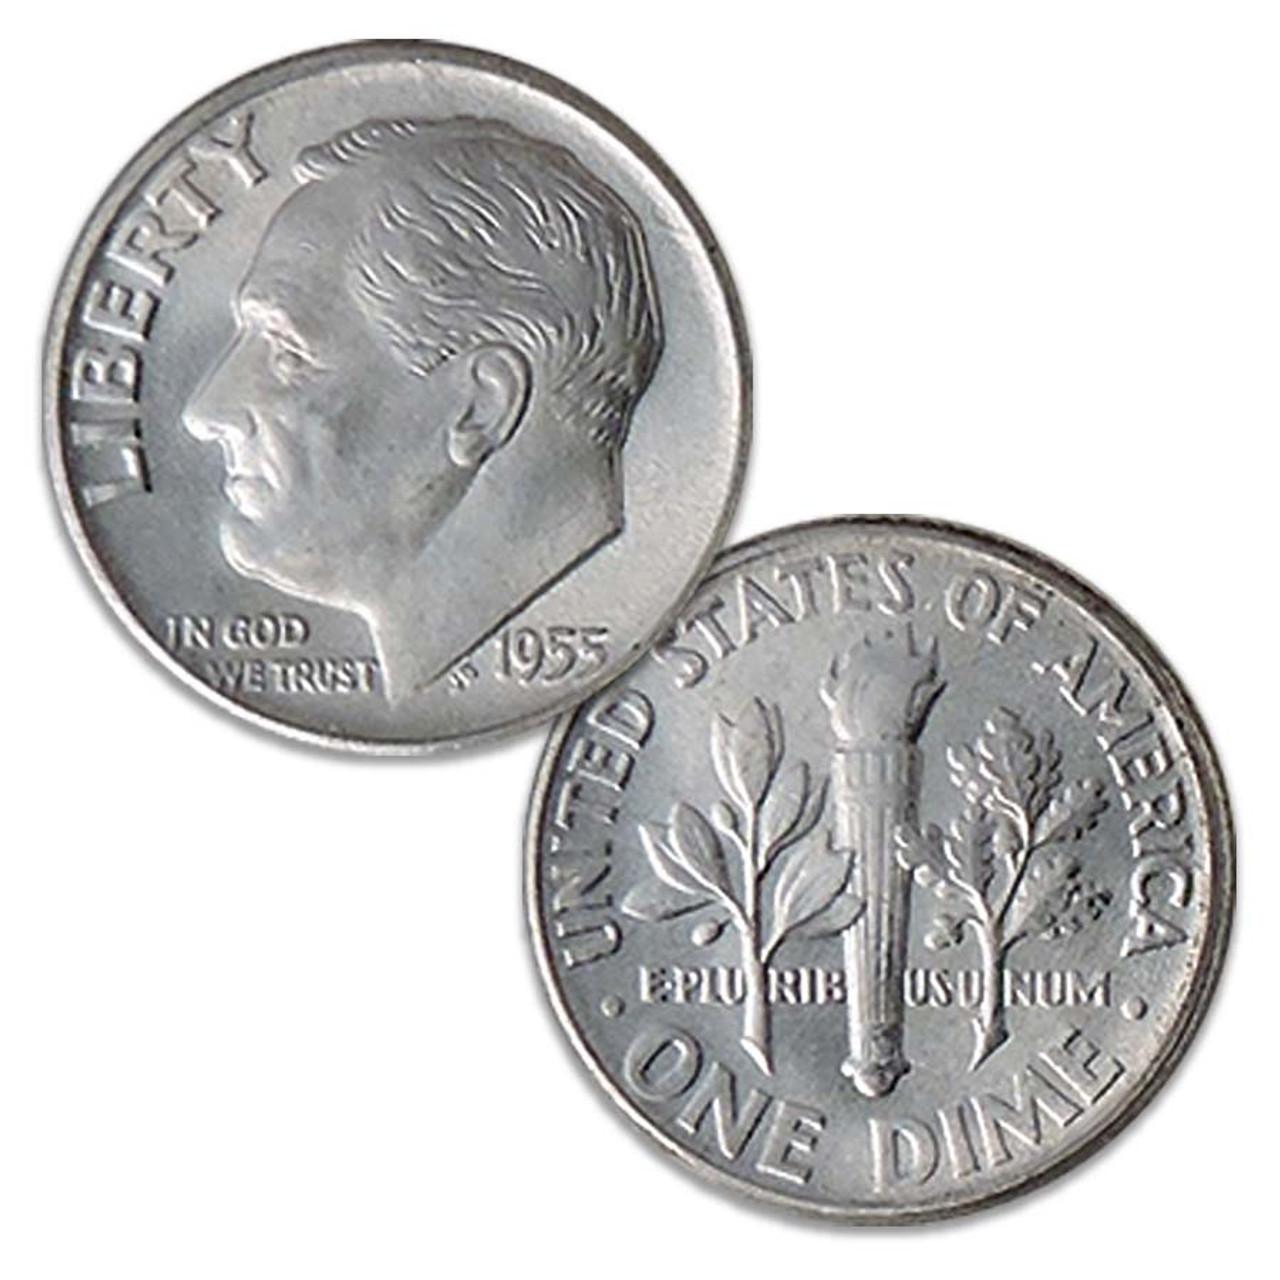 1955-D Roosevelt Silver Dime Brilliant Uncirculated Image 1